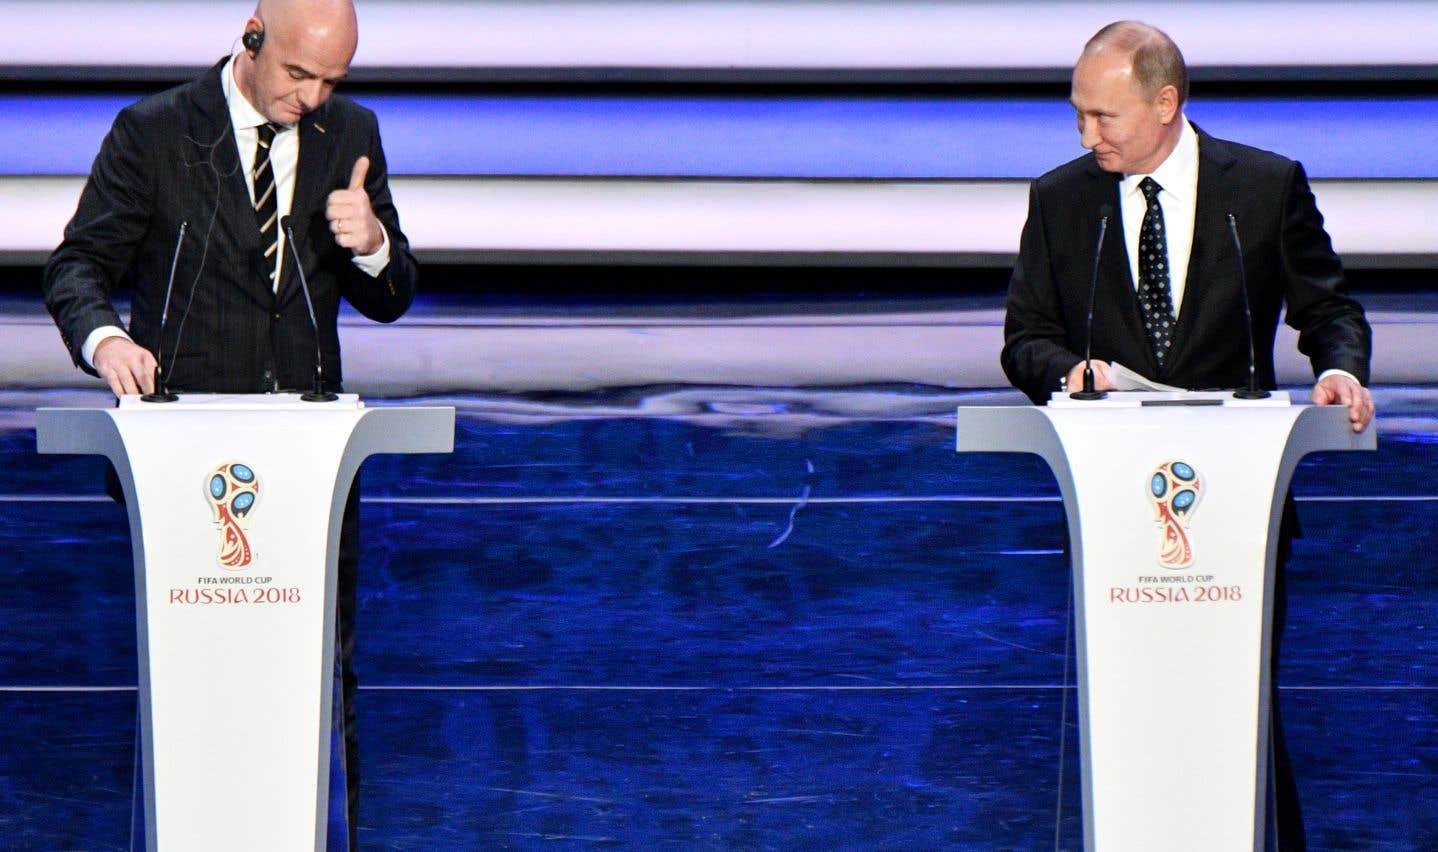 Mondial de soccer 2018: la «fête sportive grandiose» de Vladimir Poutine